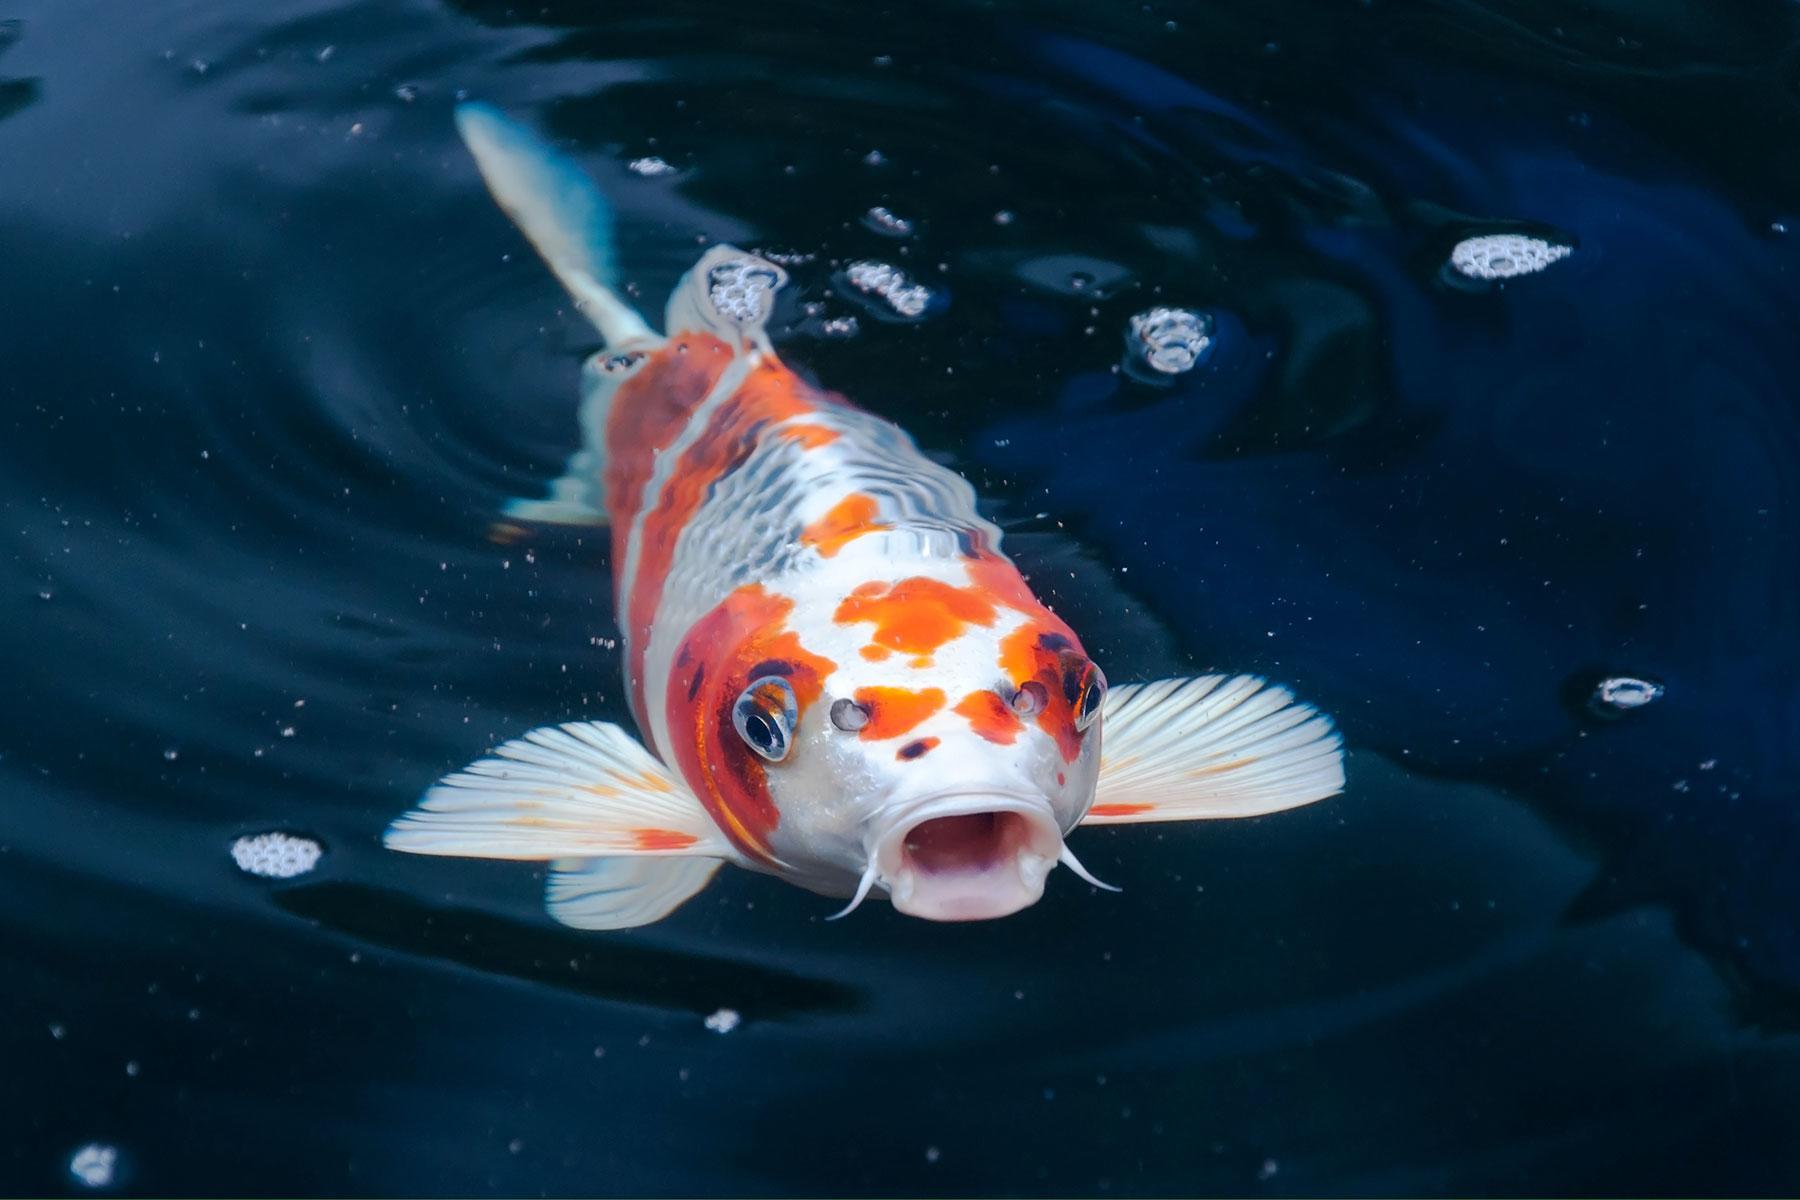 13 festivals at botanic gardens 2018 for Keeping koi fish